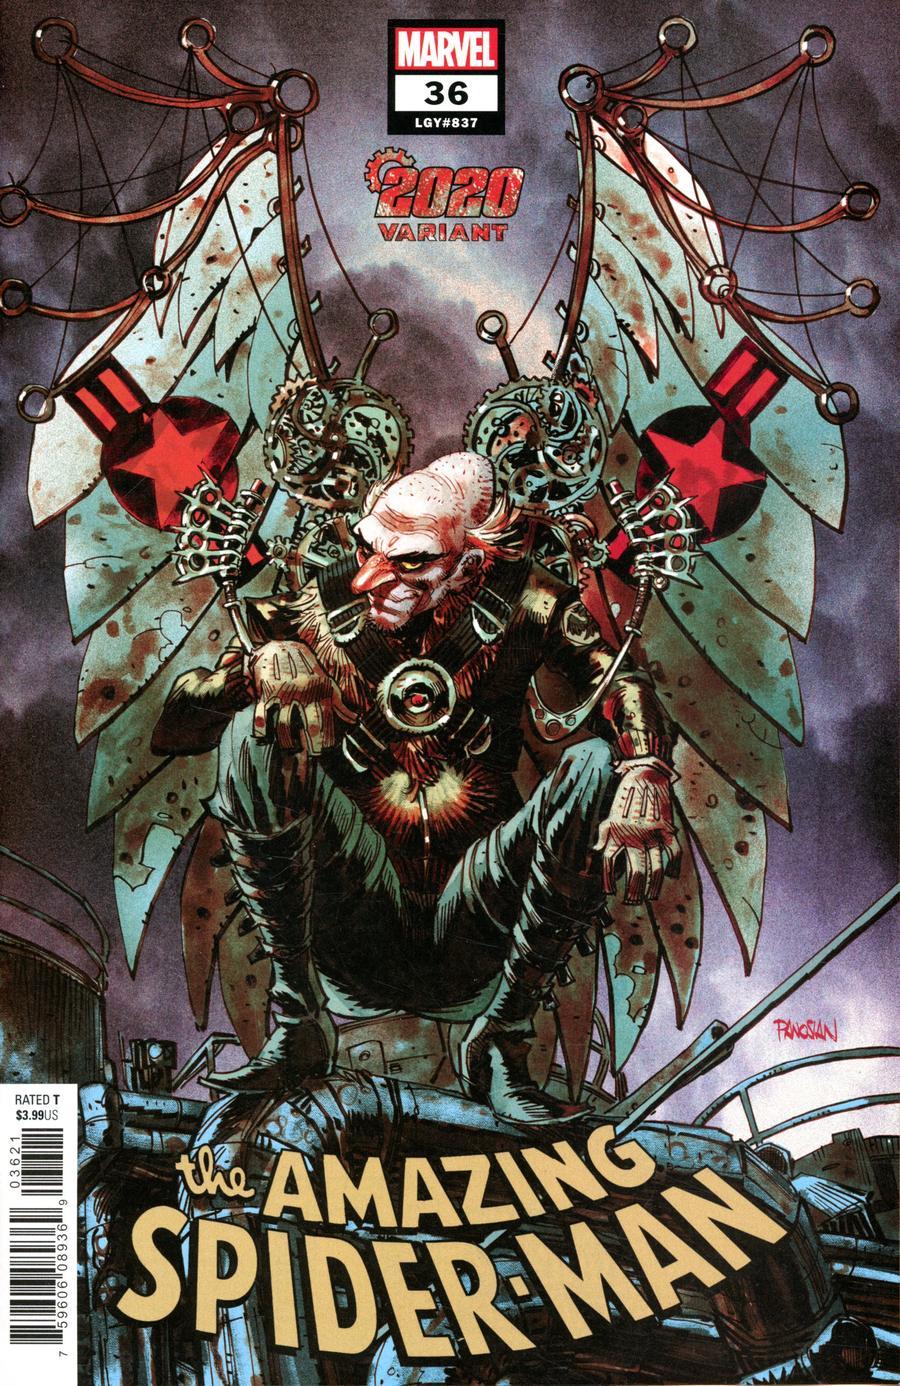 Amazing Spider-Man Vol 5 #36 Cover B Variant Dan Panosian 2020 Cover (2099 Tie-In)